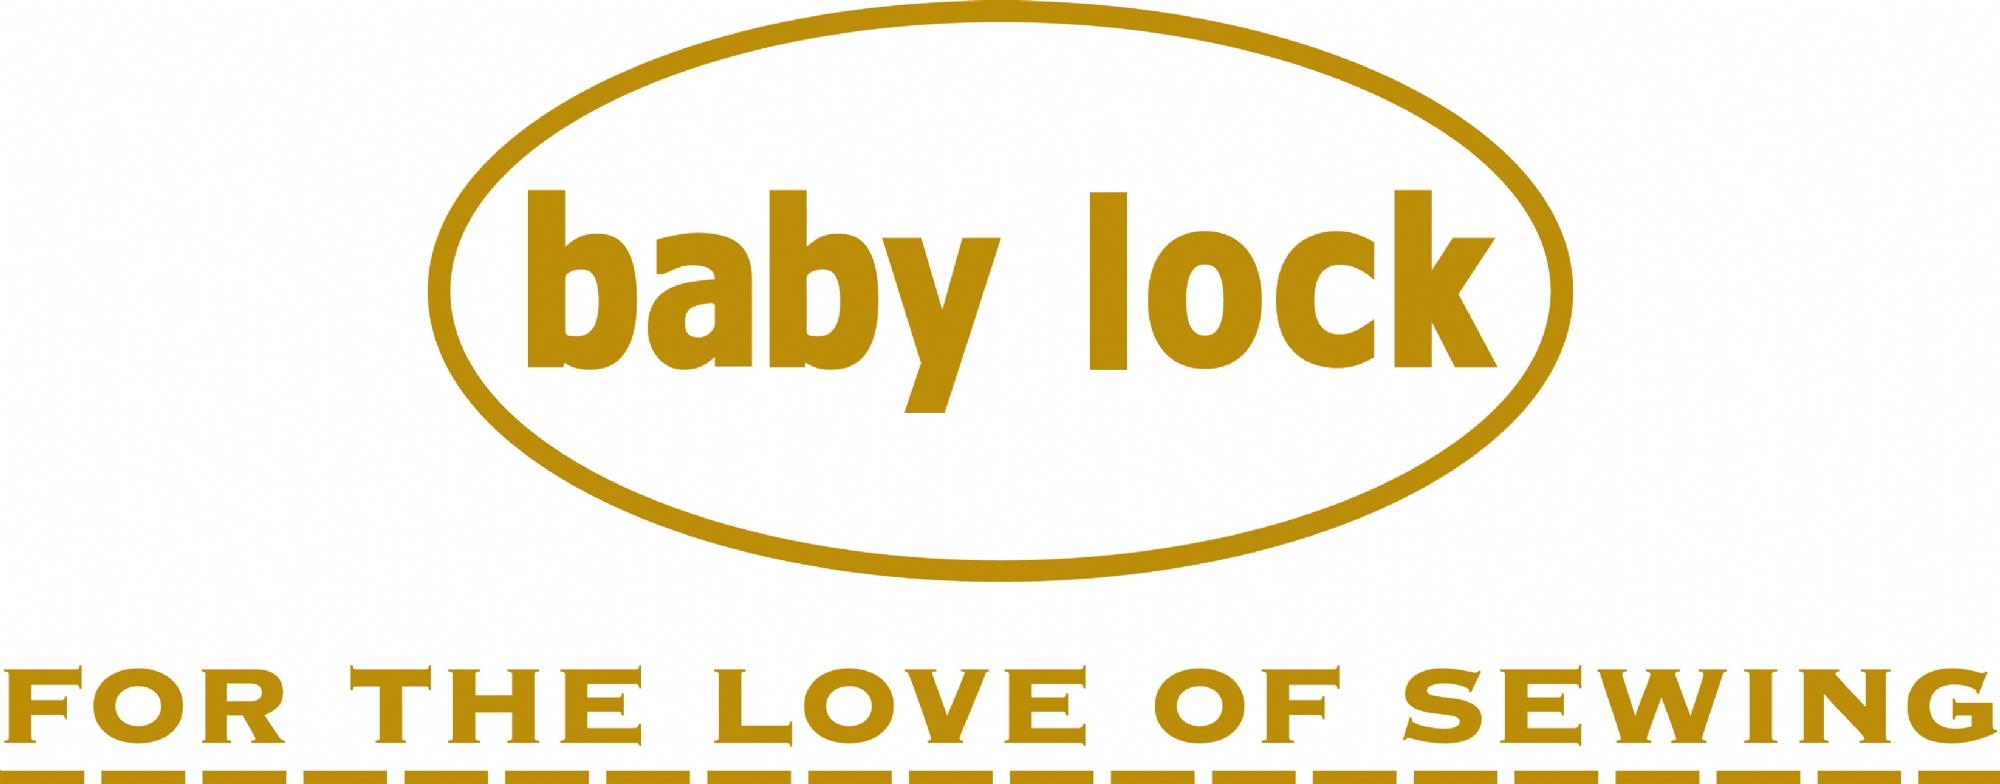 Babylock_StackedlogoPMS_Tag.jpg